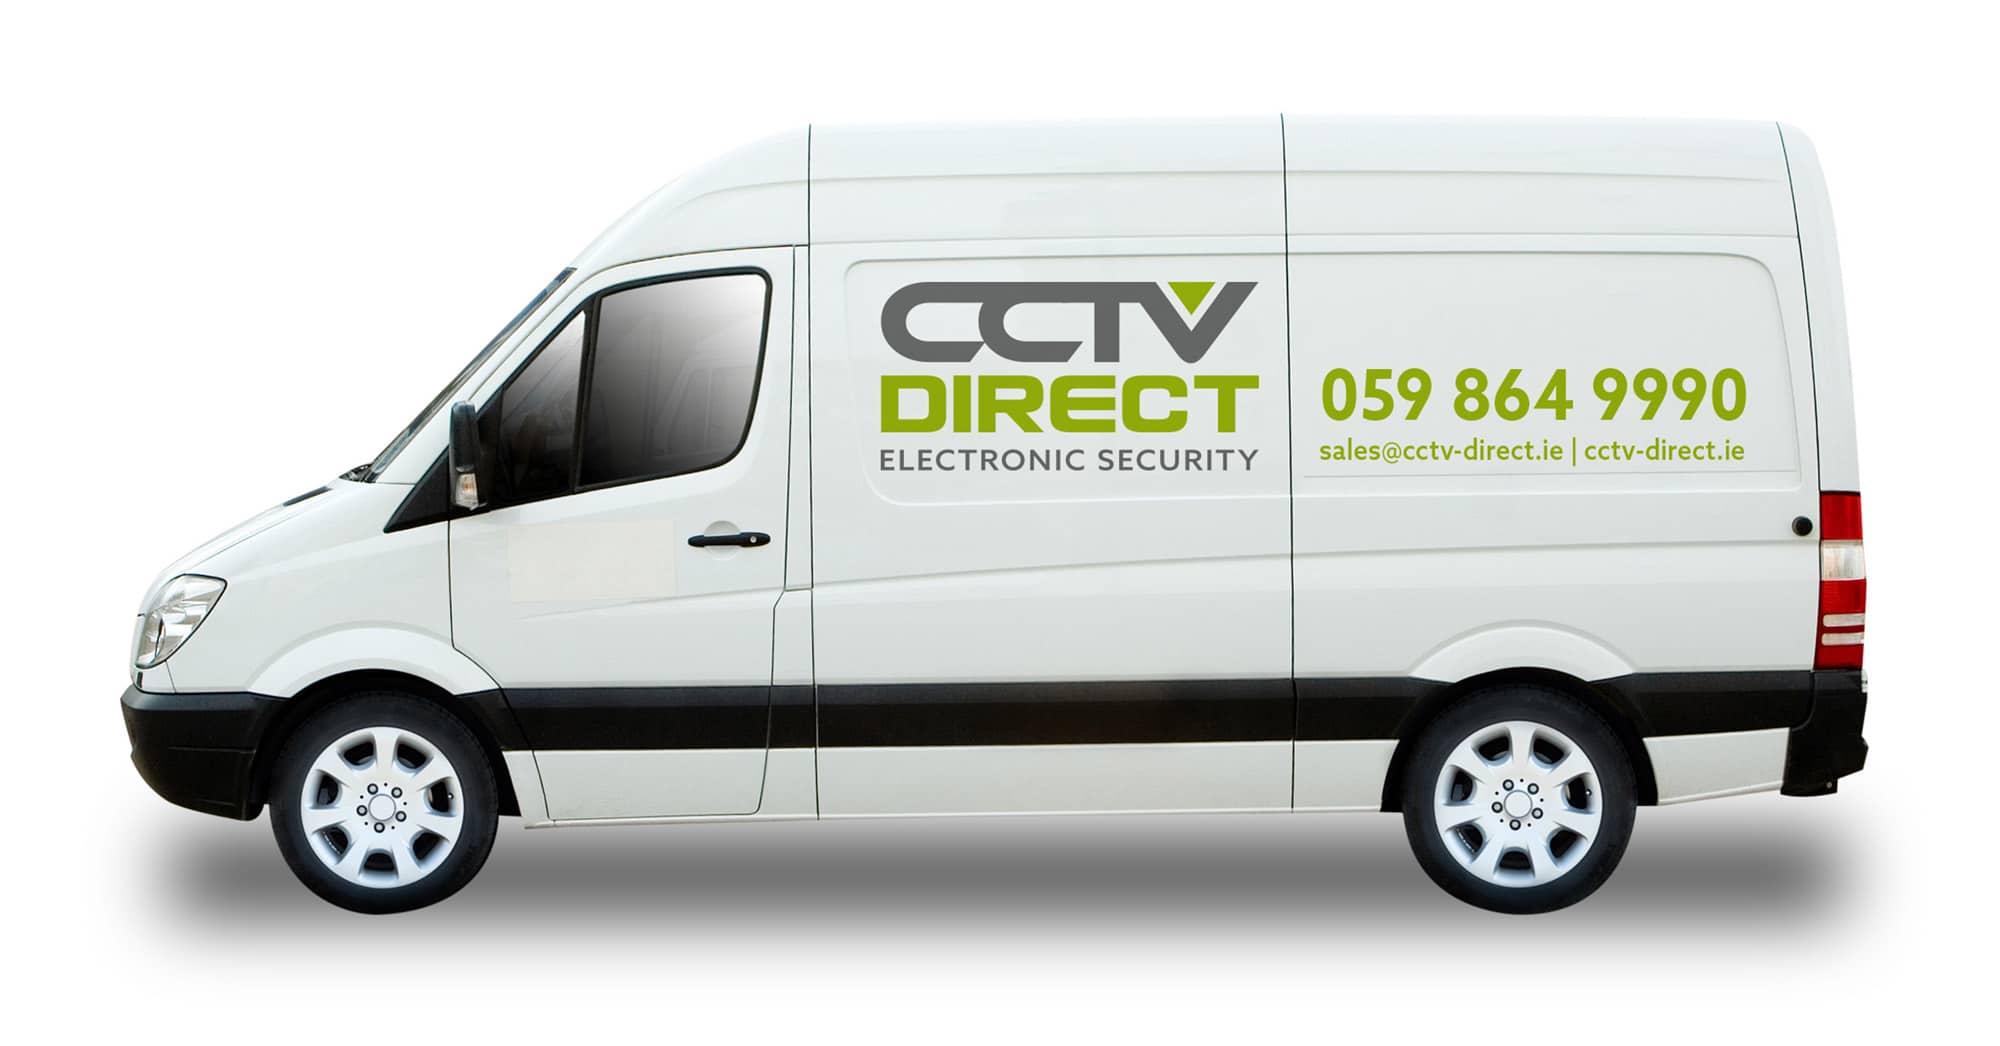 CCTV Direct | Burglar Alarms | Intruder Alarms